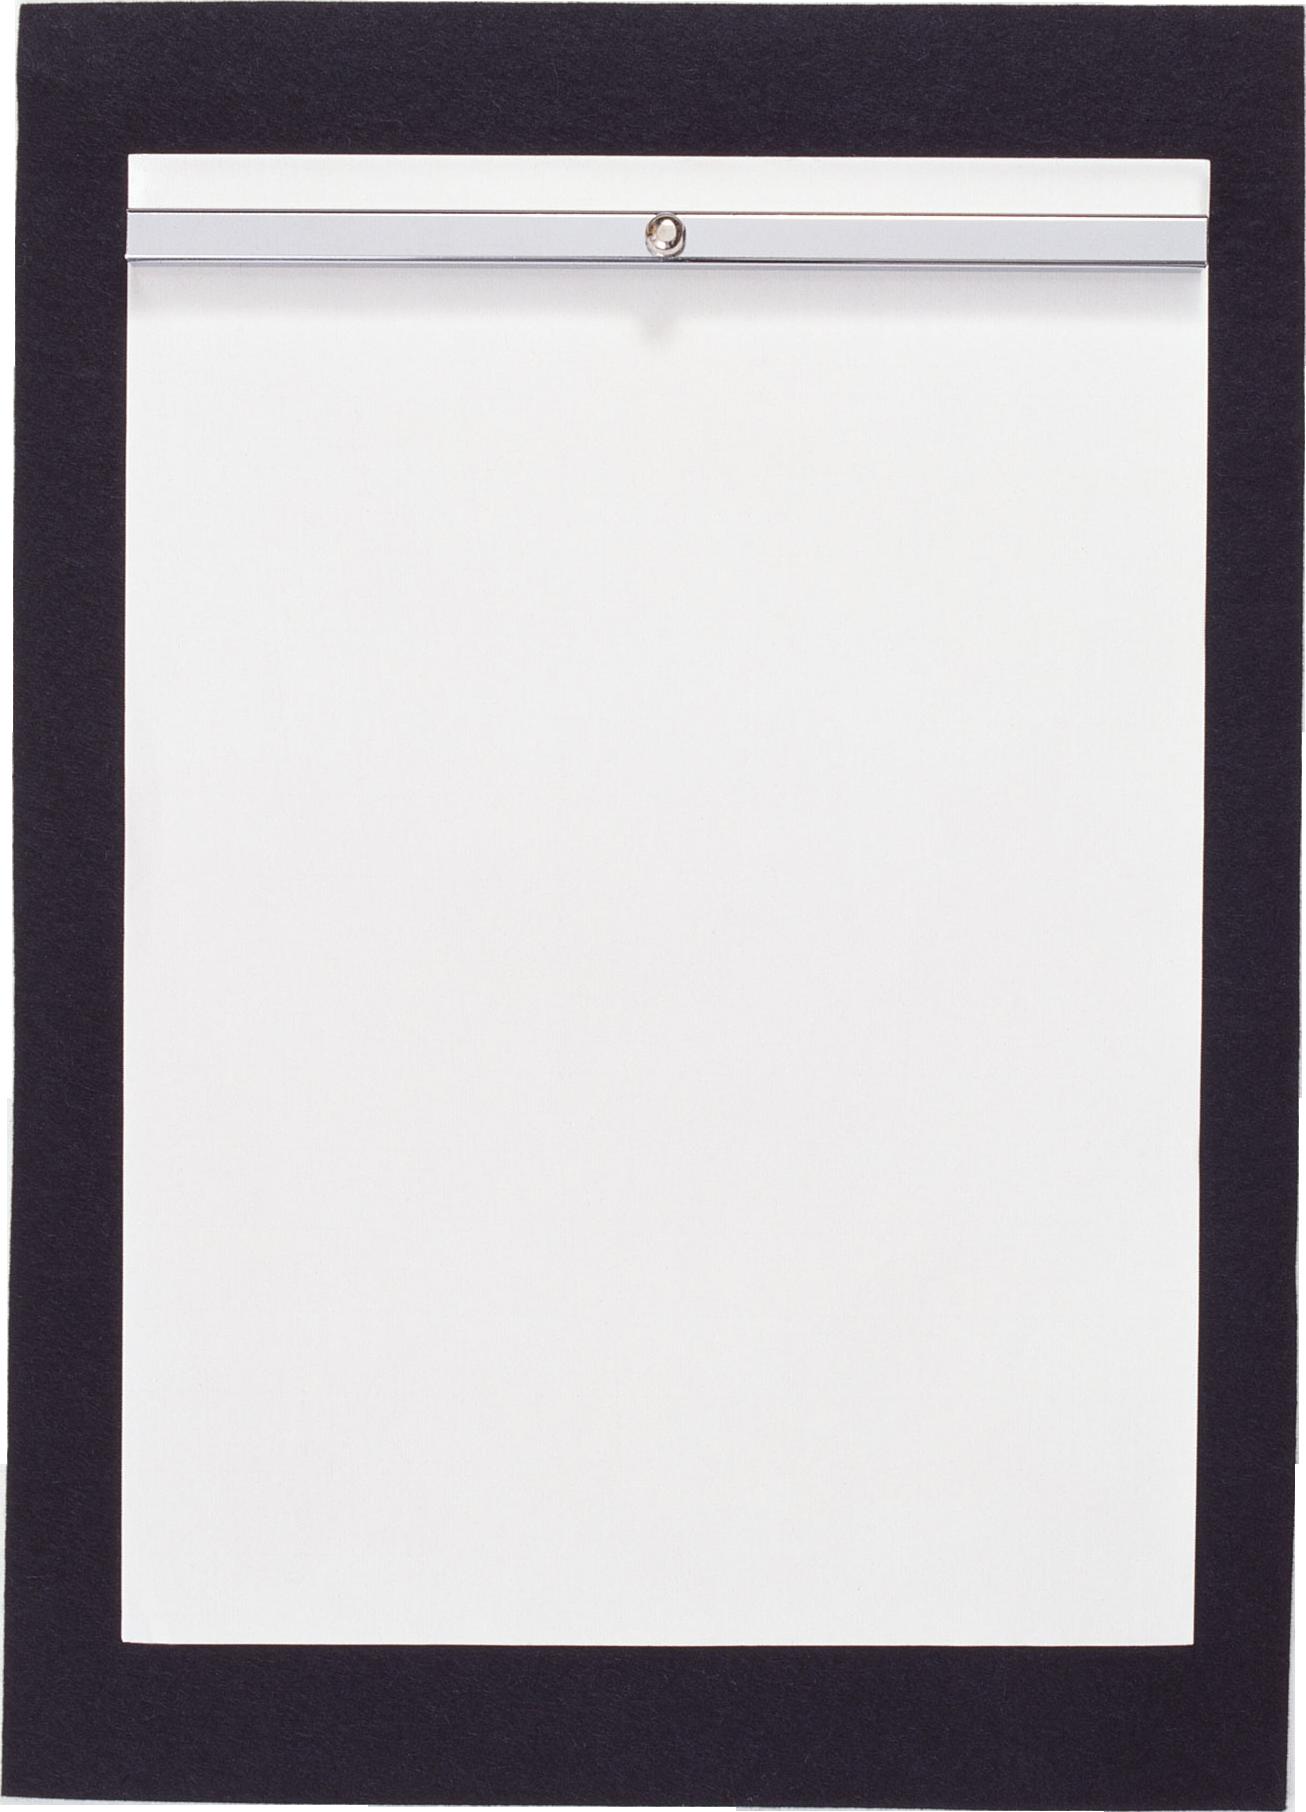 Paper Sheet PNG - 13461